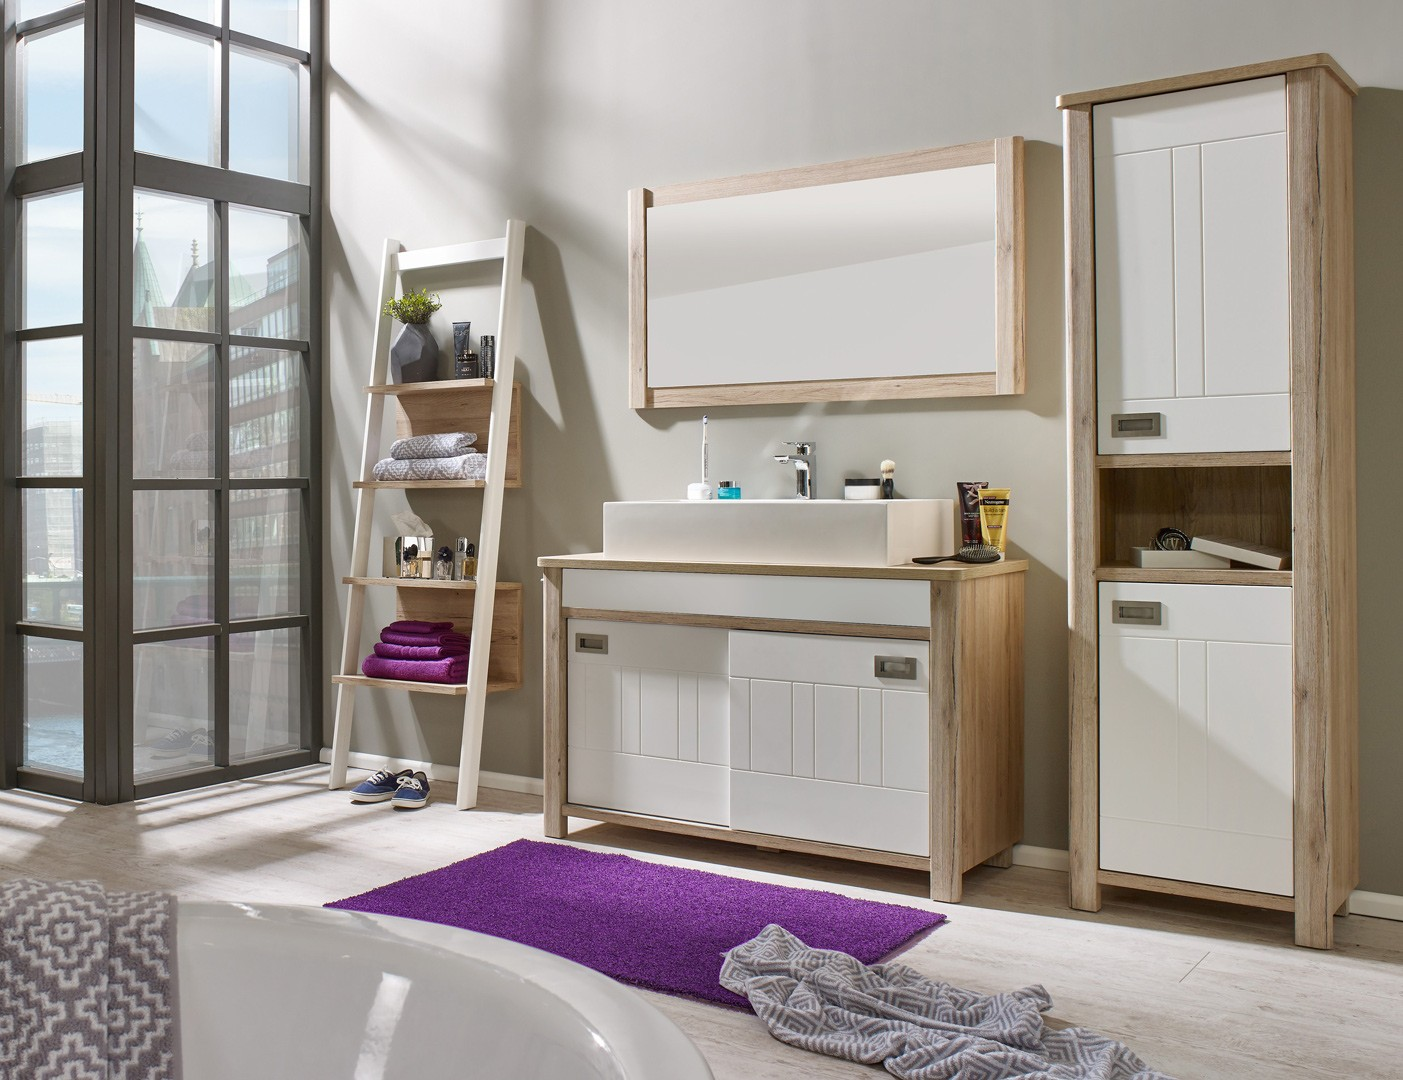 Ensemble de salle de bain contemporain chêne/blanc mat Steven | Matelpro